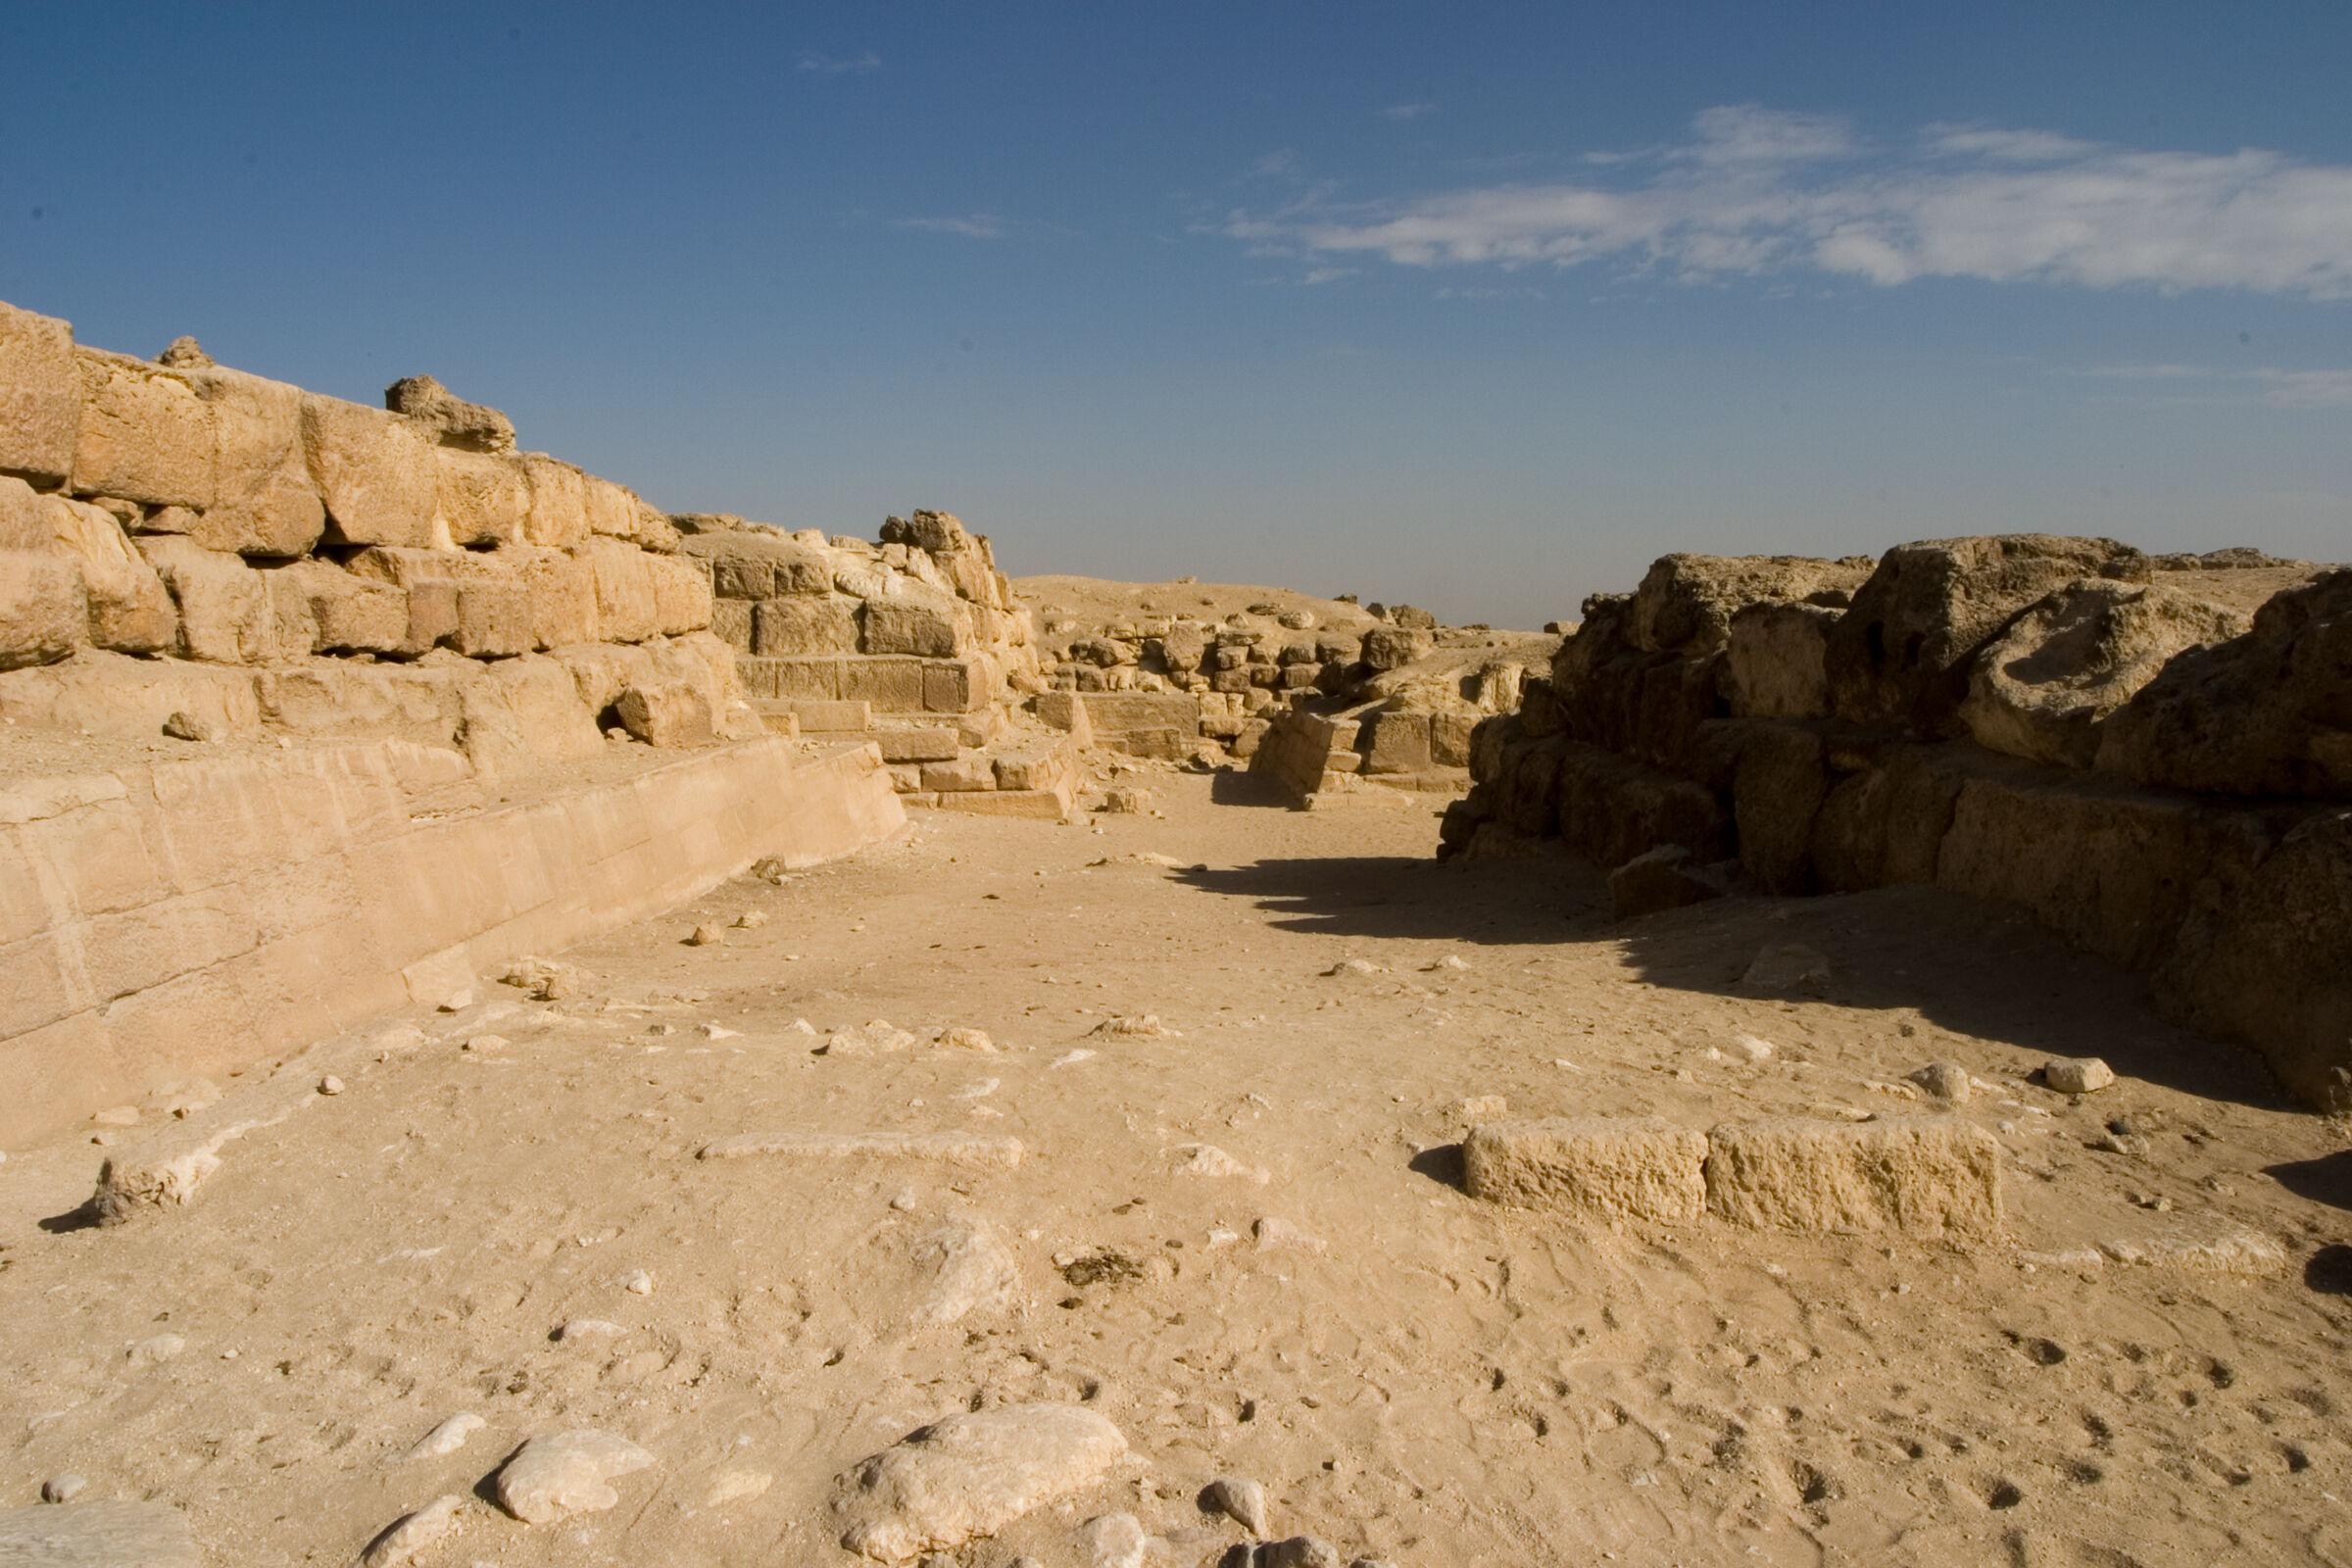 Eastern Cemetery: Site: Giza; View: avenue G 2, G 7510, G 7310-7320, G 7410-7420, G 7330-7340, G 7430-7440